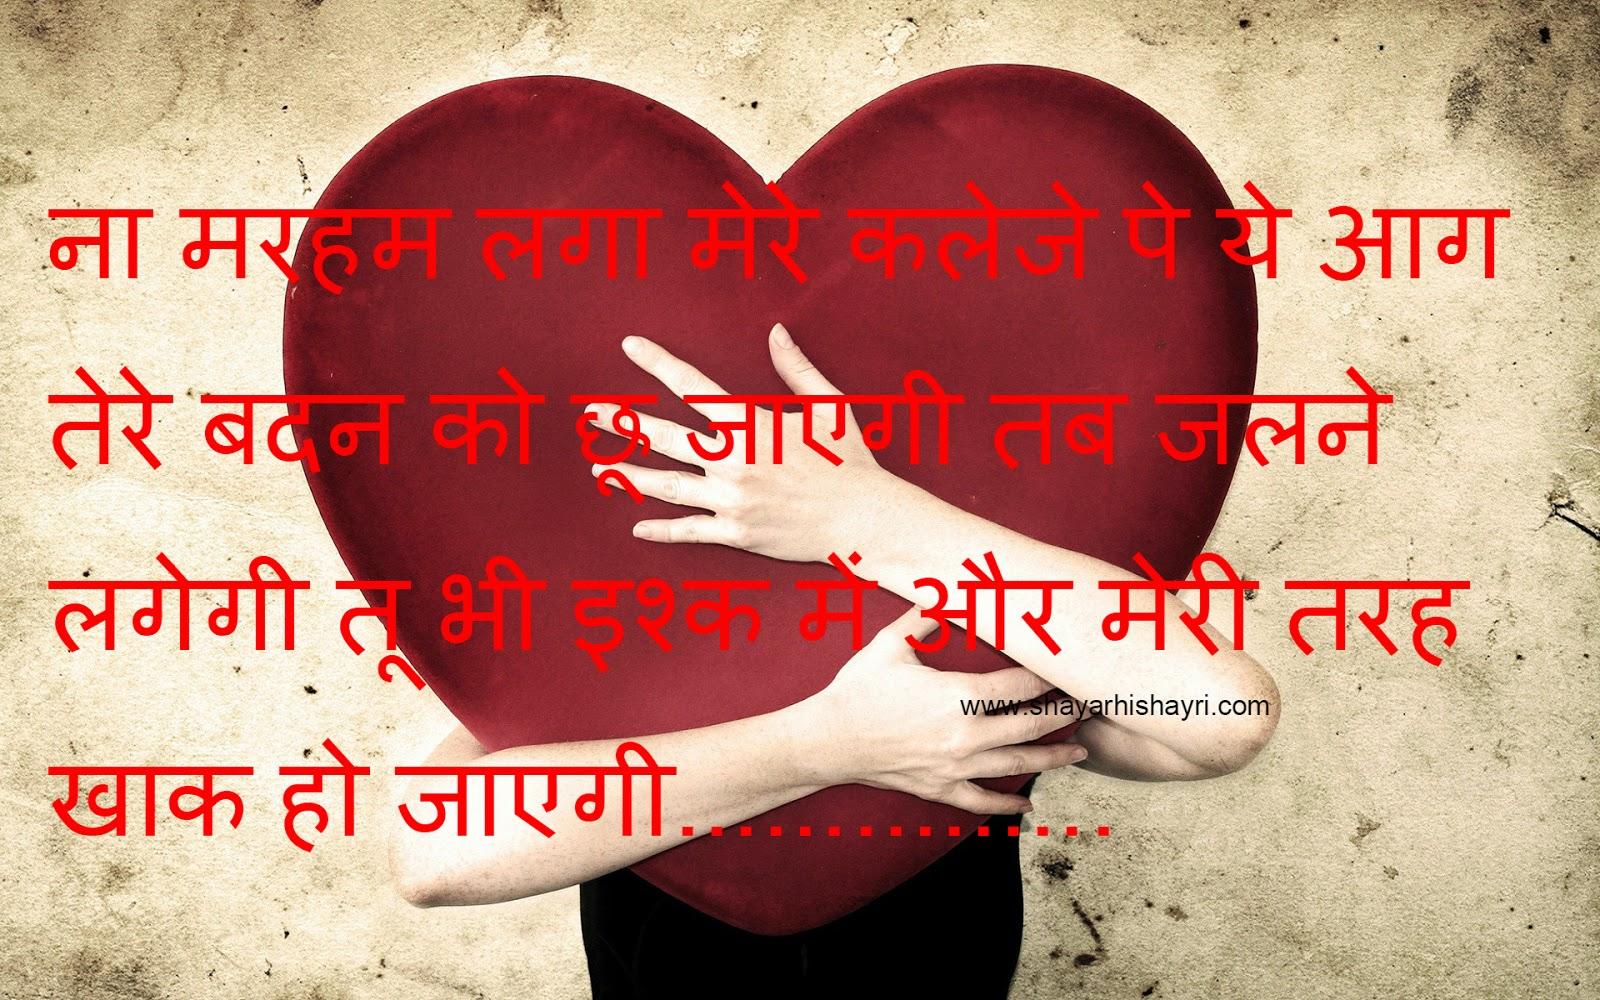 Daily Update Shayari Imageshayari Image Facebooklove With Images Hindi Love Wallpaper For Facebook 2018love